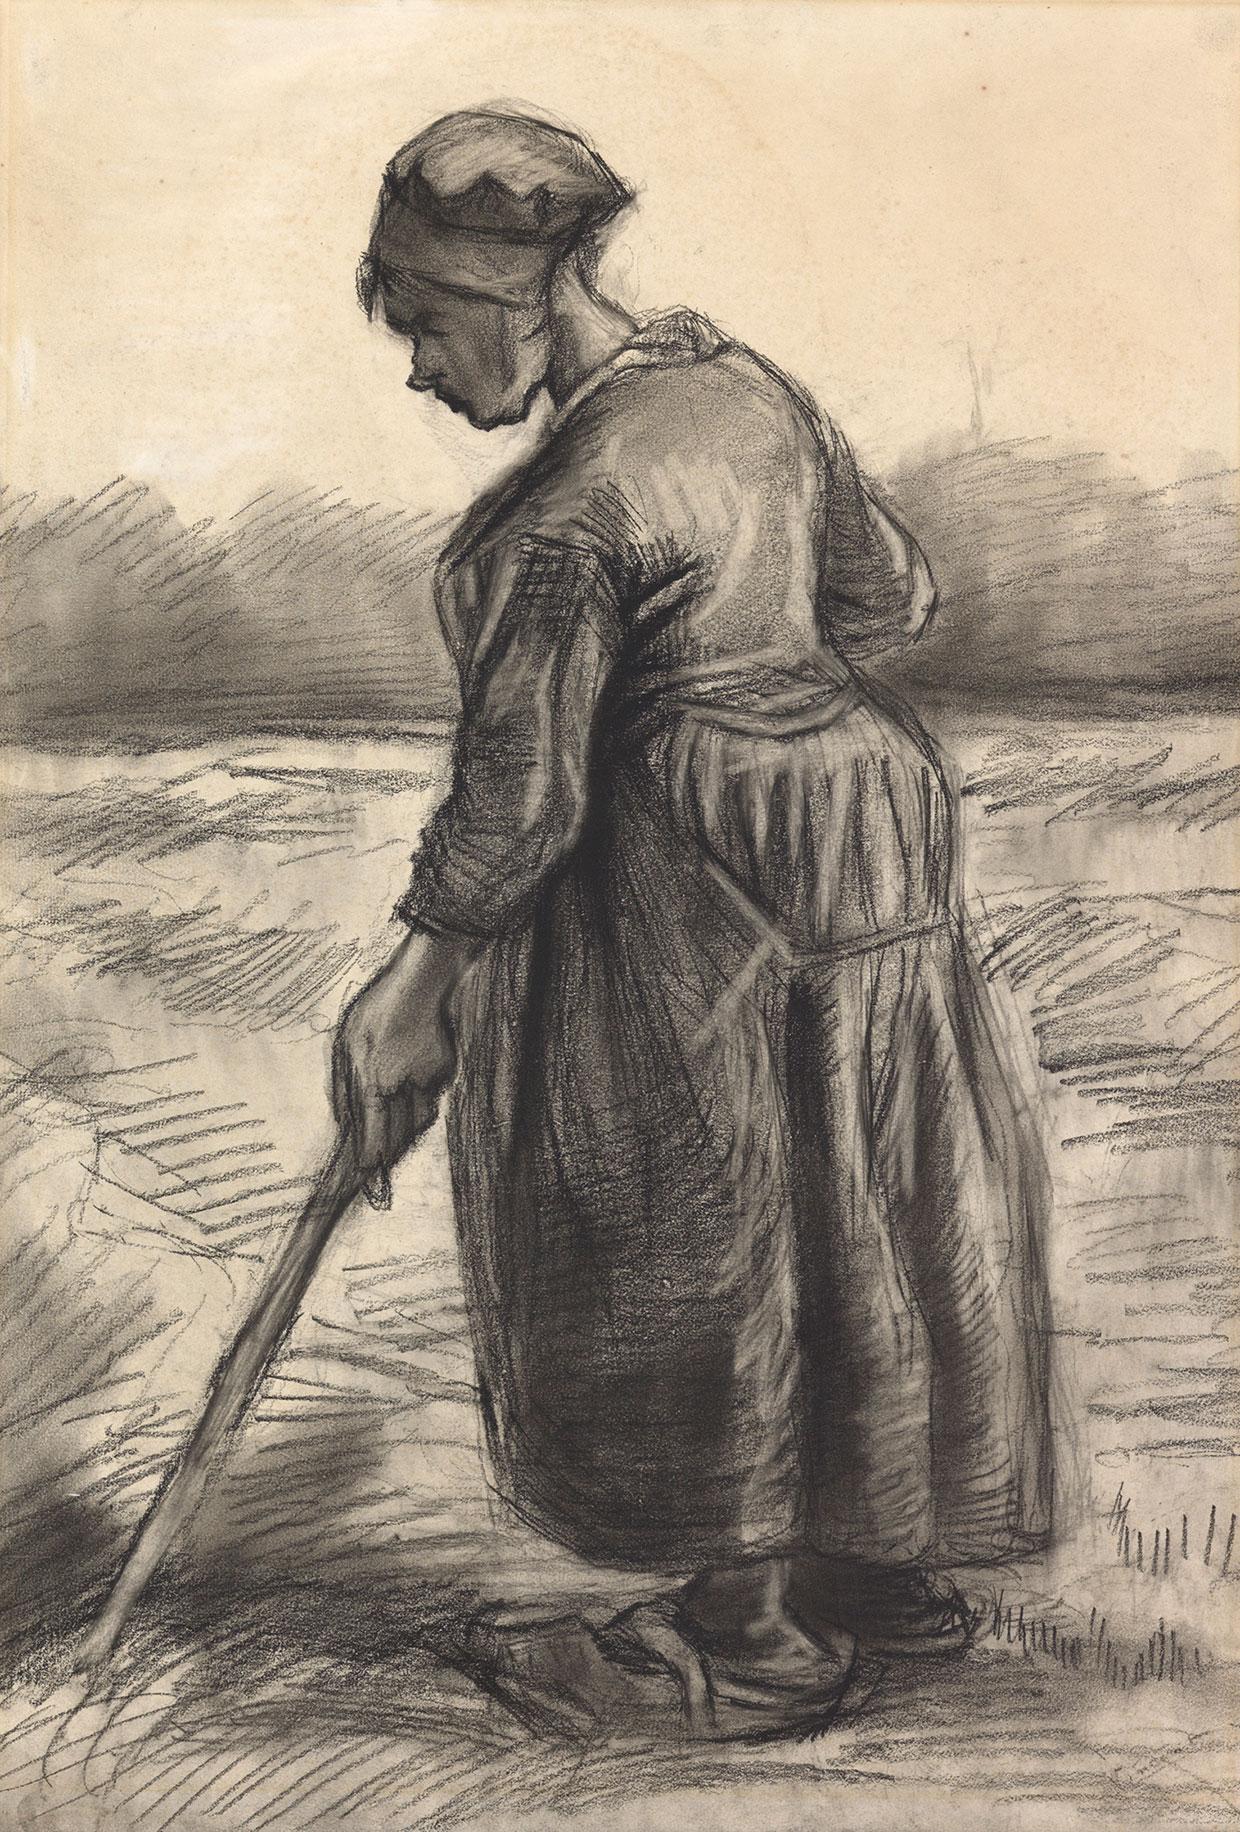 Vincent van Gogh, Peasant woman haying, 1885. Coll. Kröller-Müller Museum, Otterlo